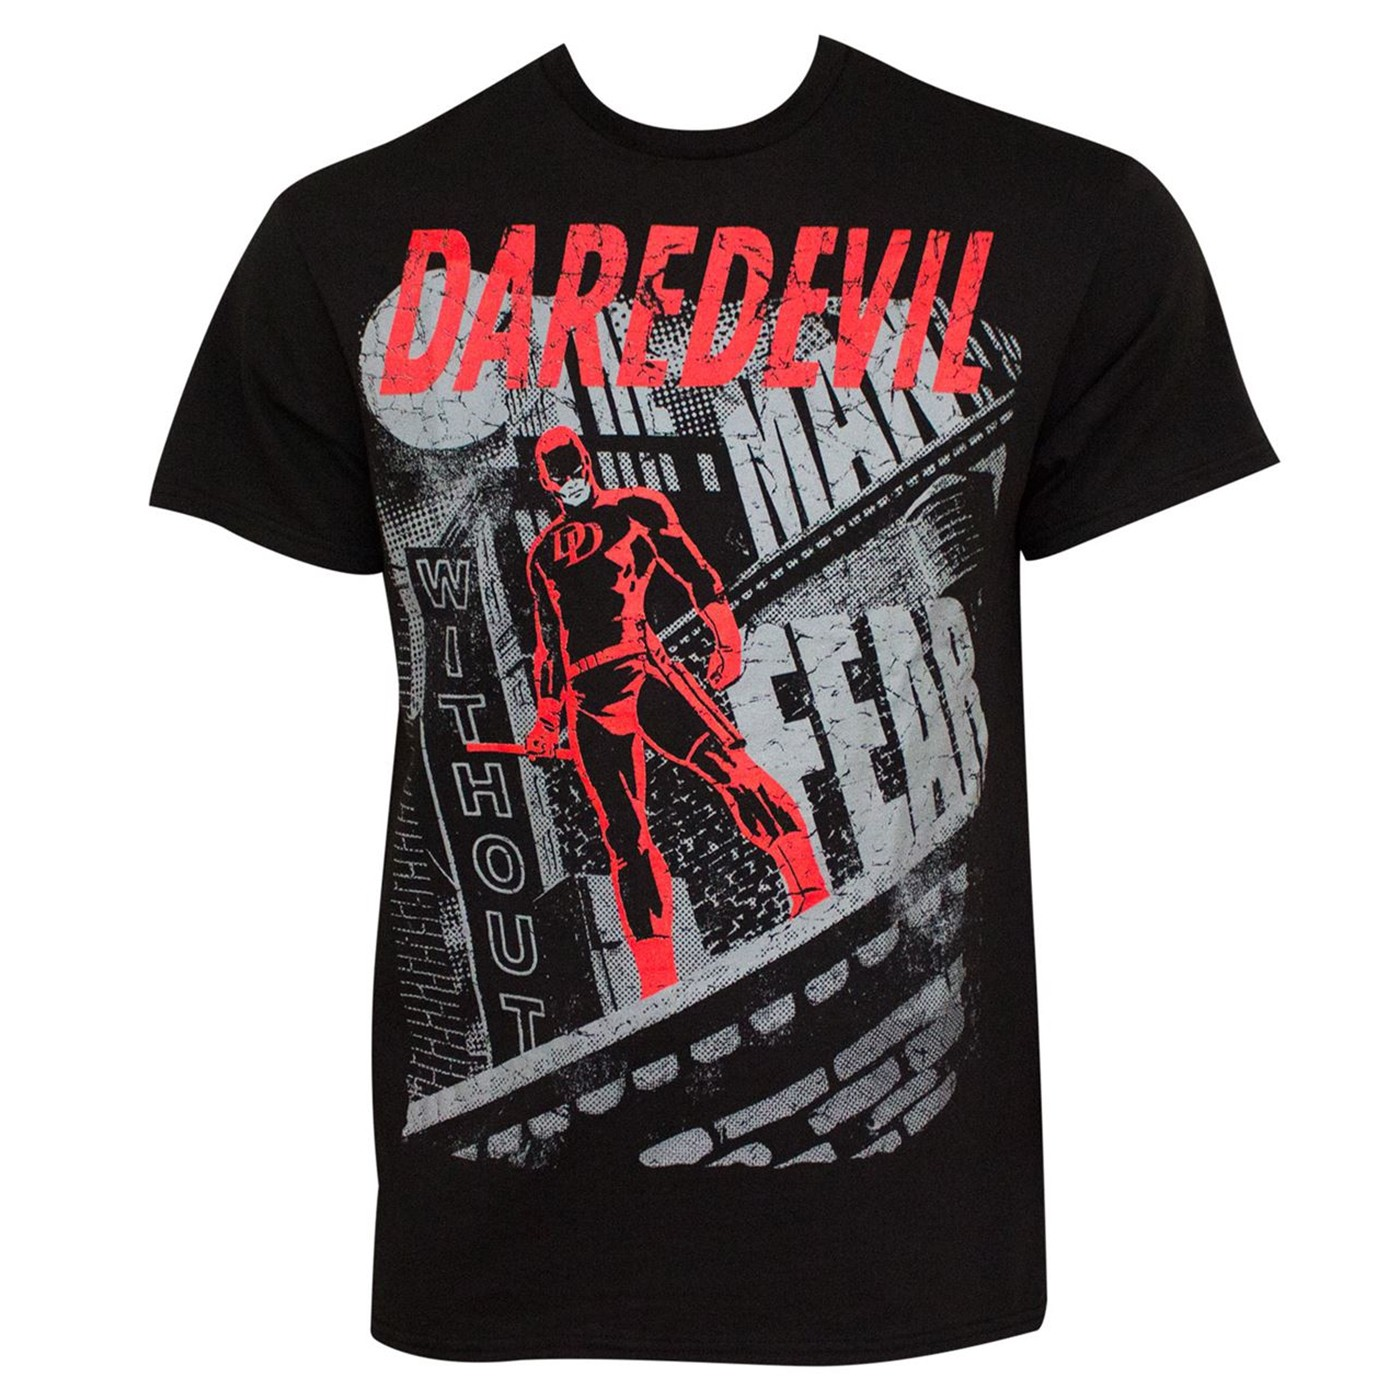 Daredevil Night Watch Men's T-Shirt